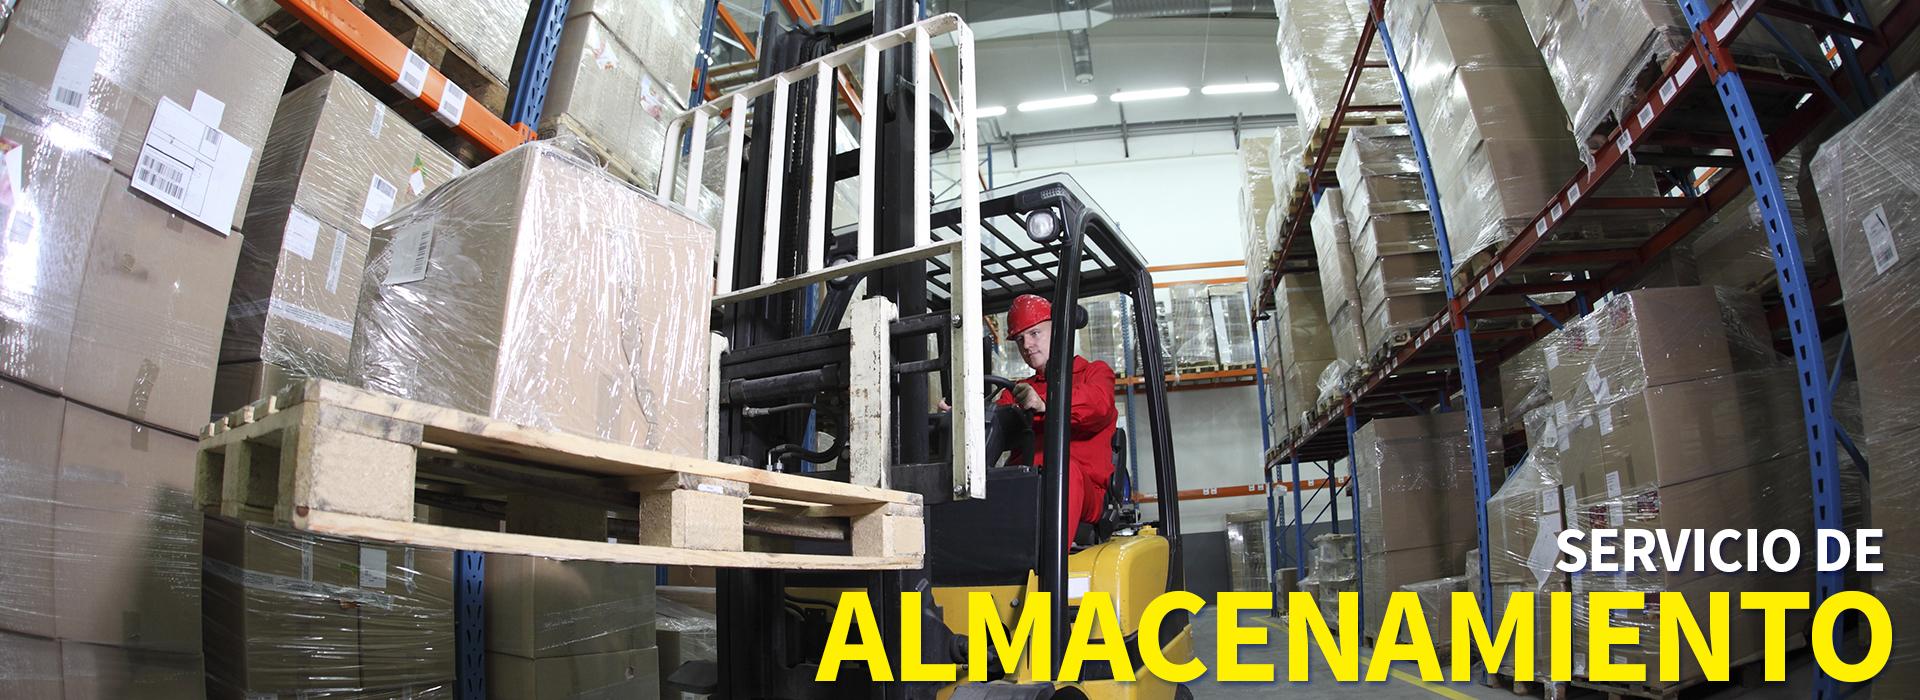 warehouse rima